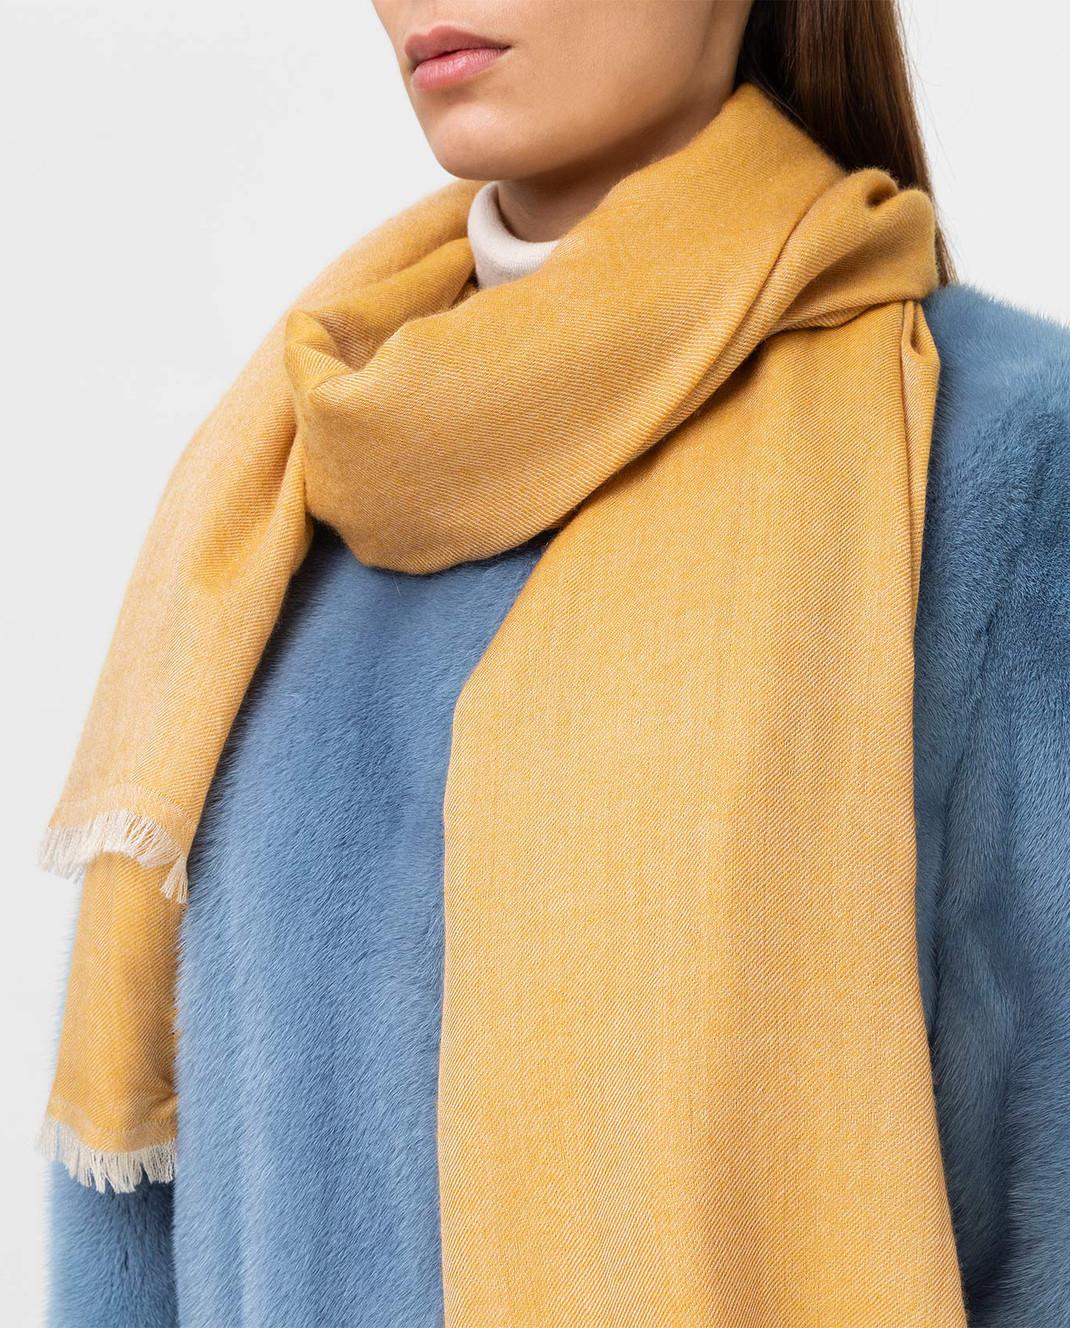 Bertolo Cashmere Желтый шарф из кашемира и шелка 000238 изображение 2